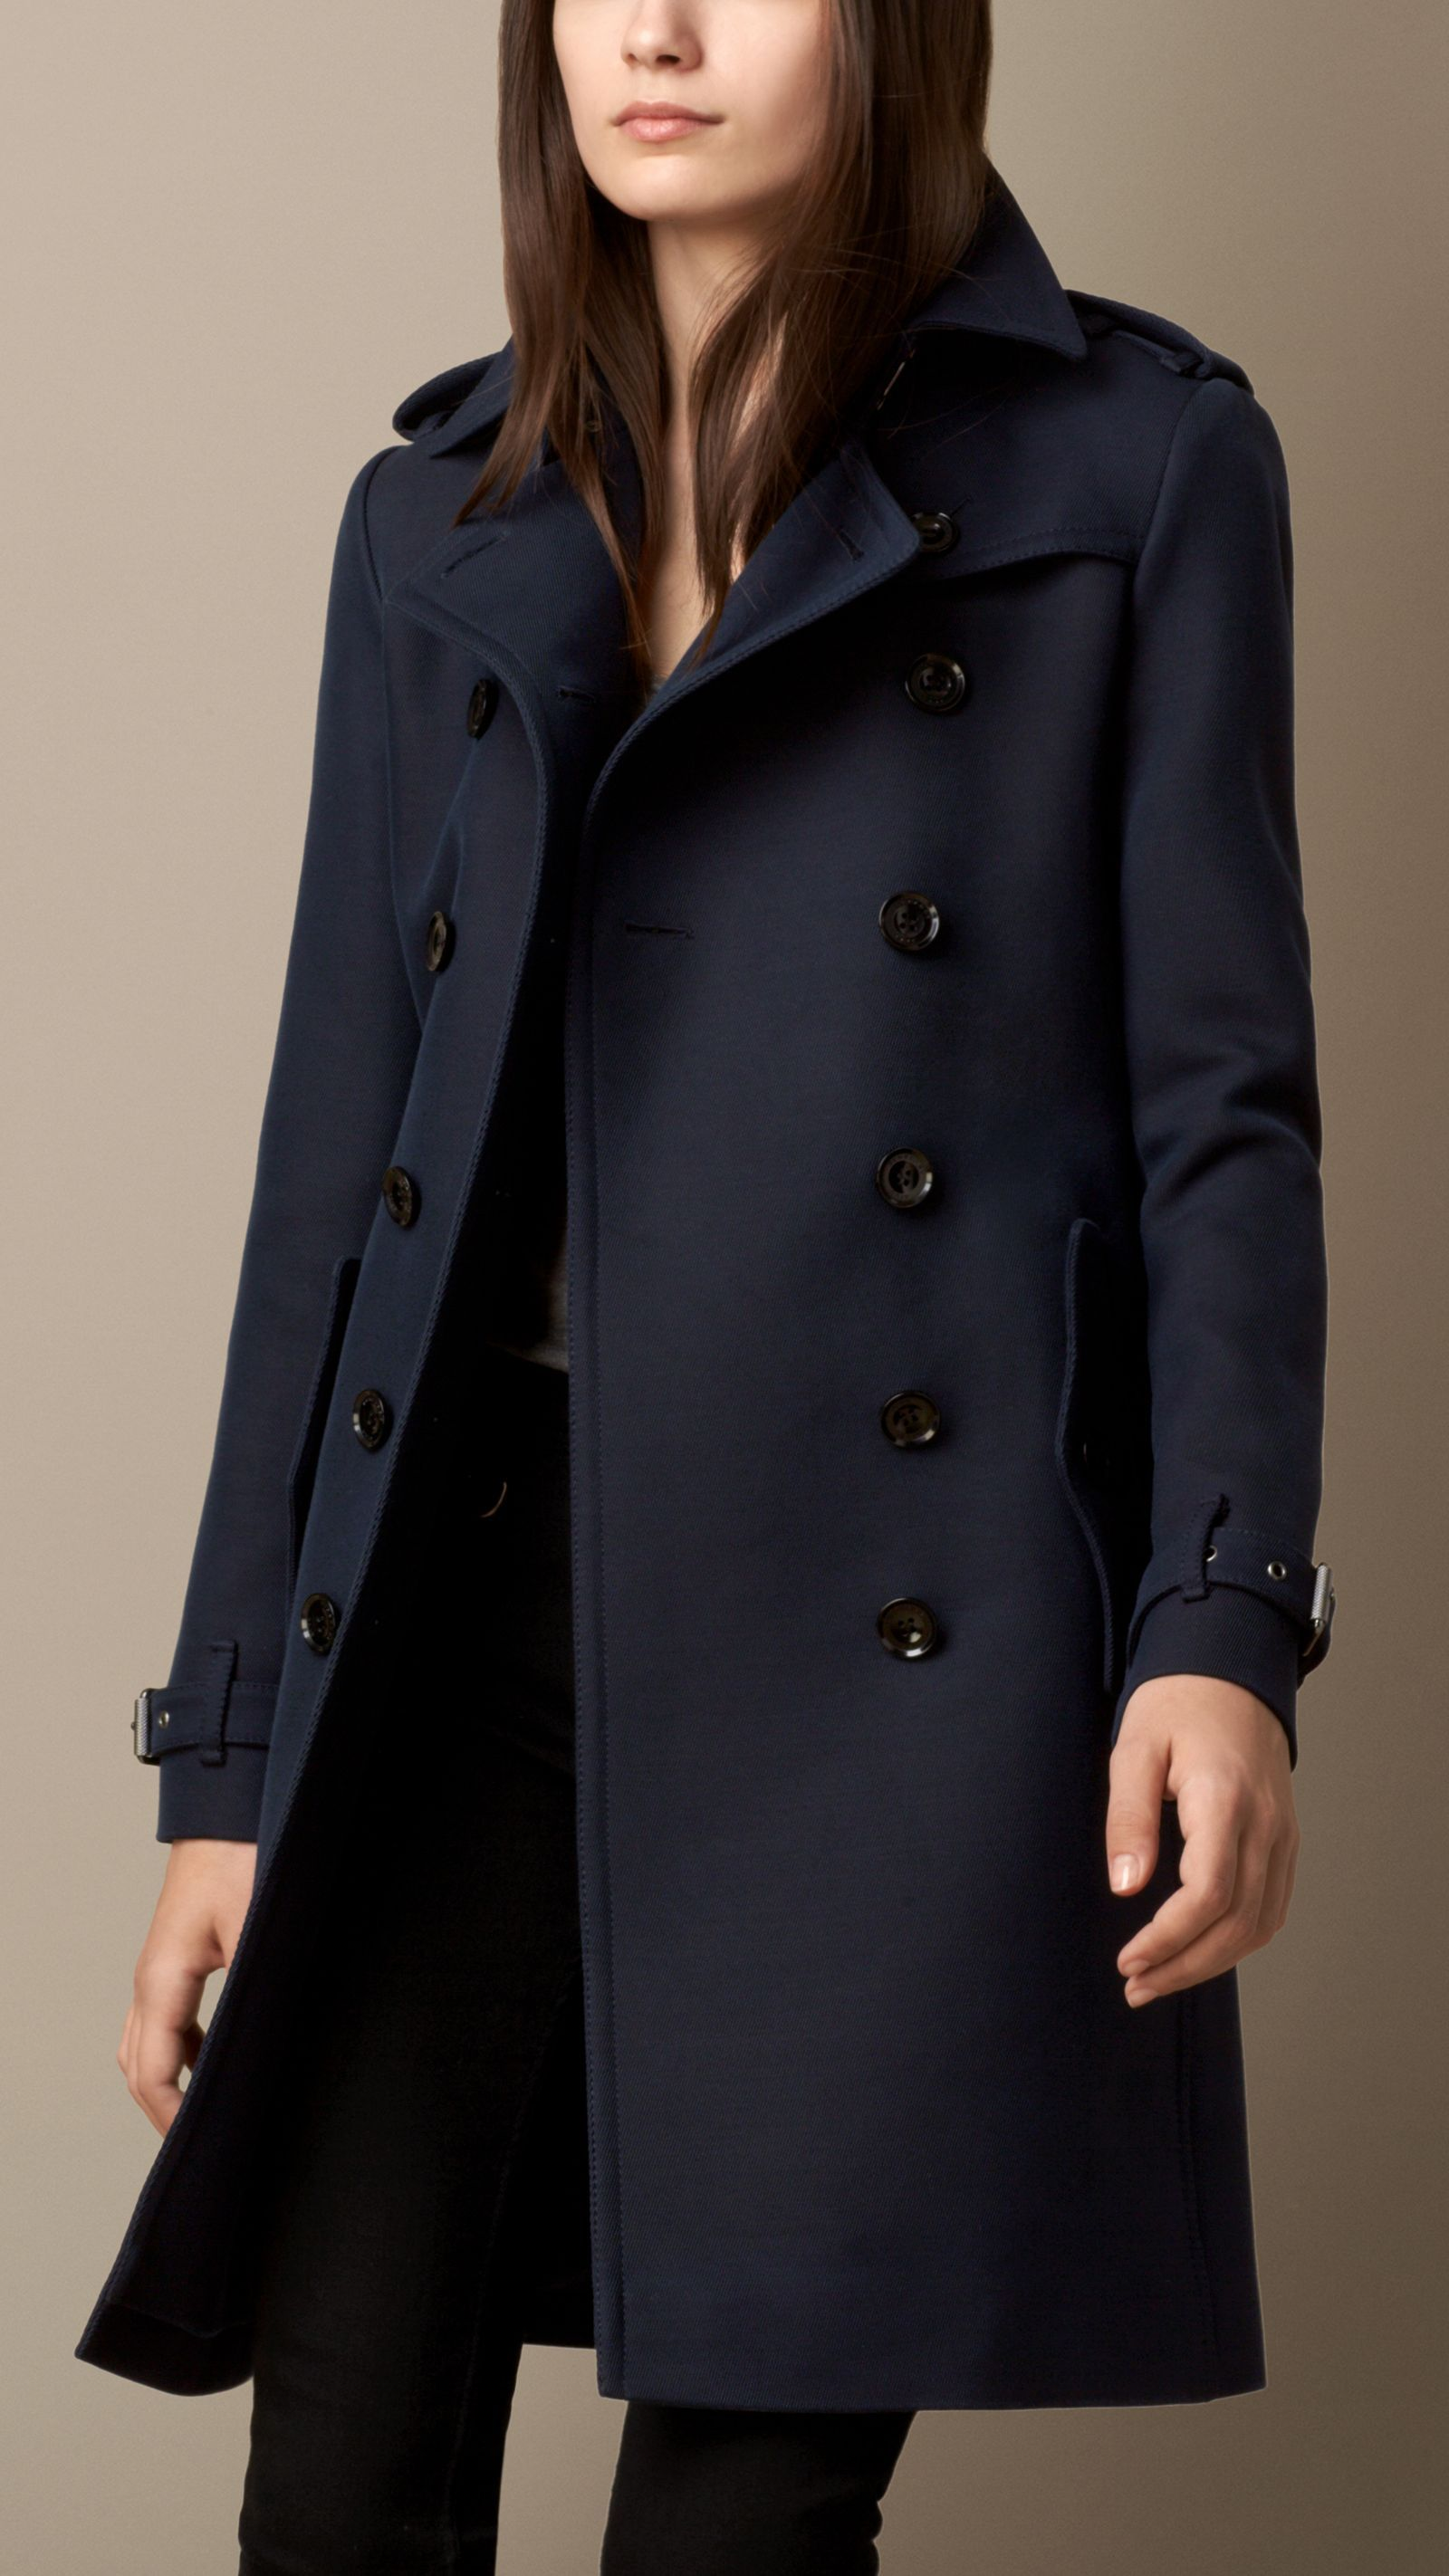 Women's Coats | Pea Coats, Duffle Coats, Parkas & more